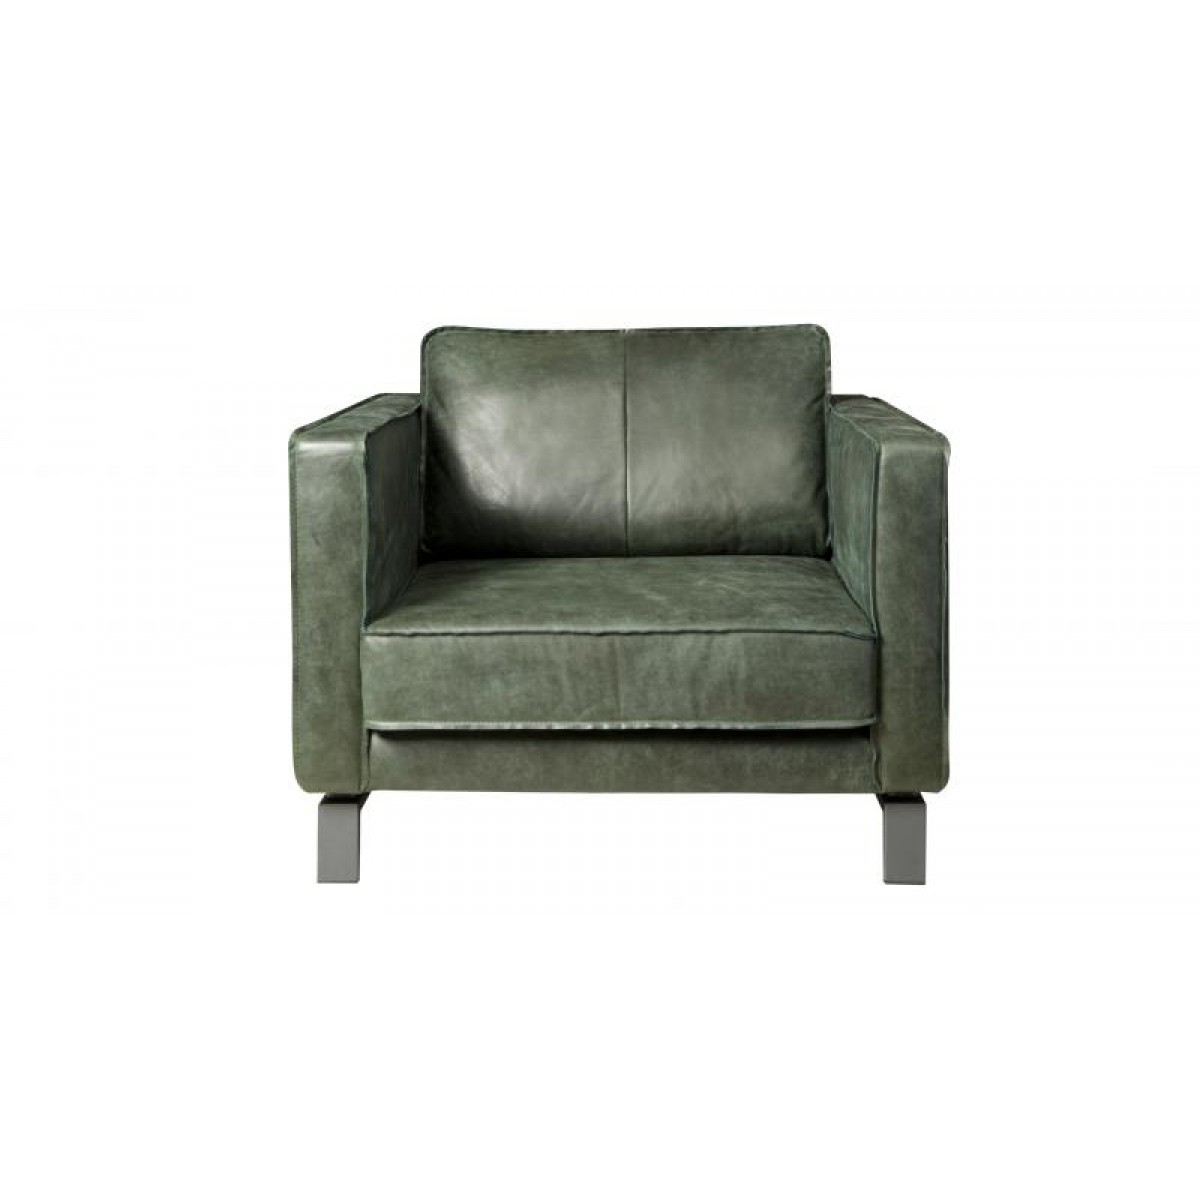 havanna-fauteuil-loveseat-leer-leder-het-anker-l'ancora